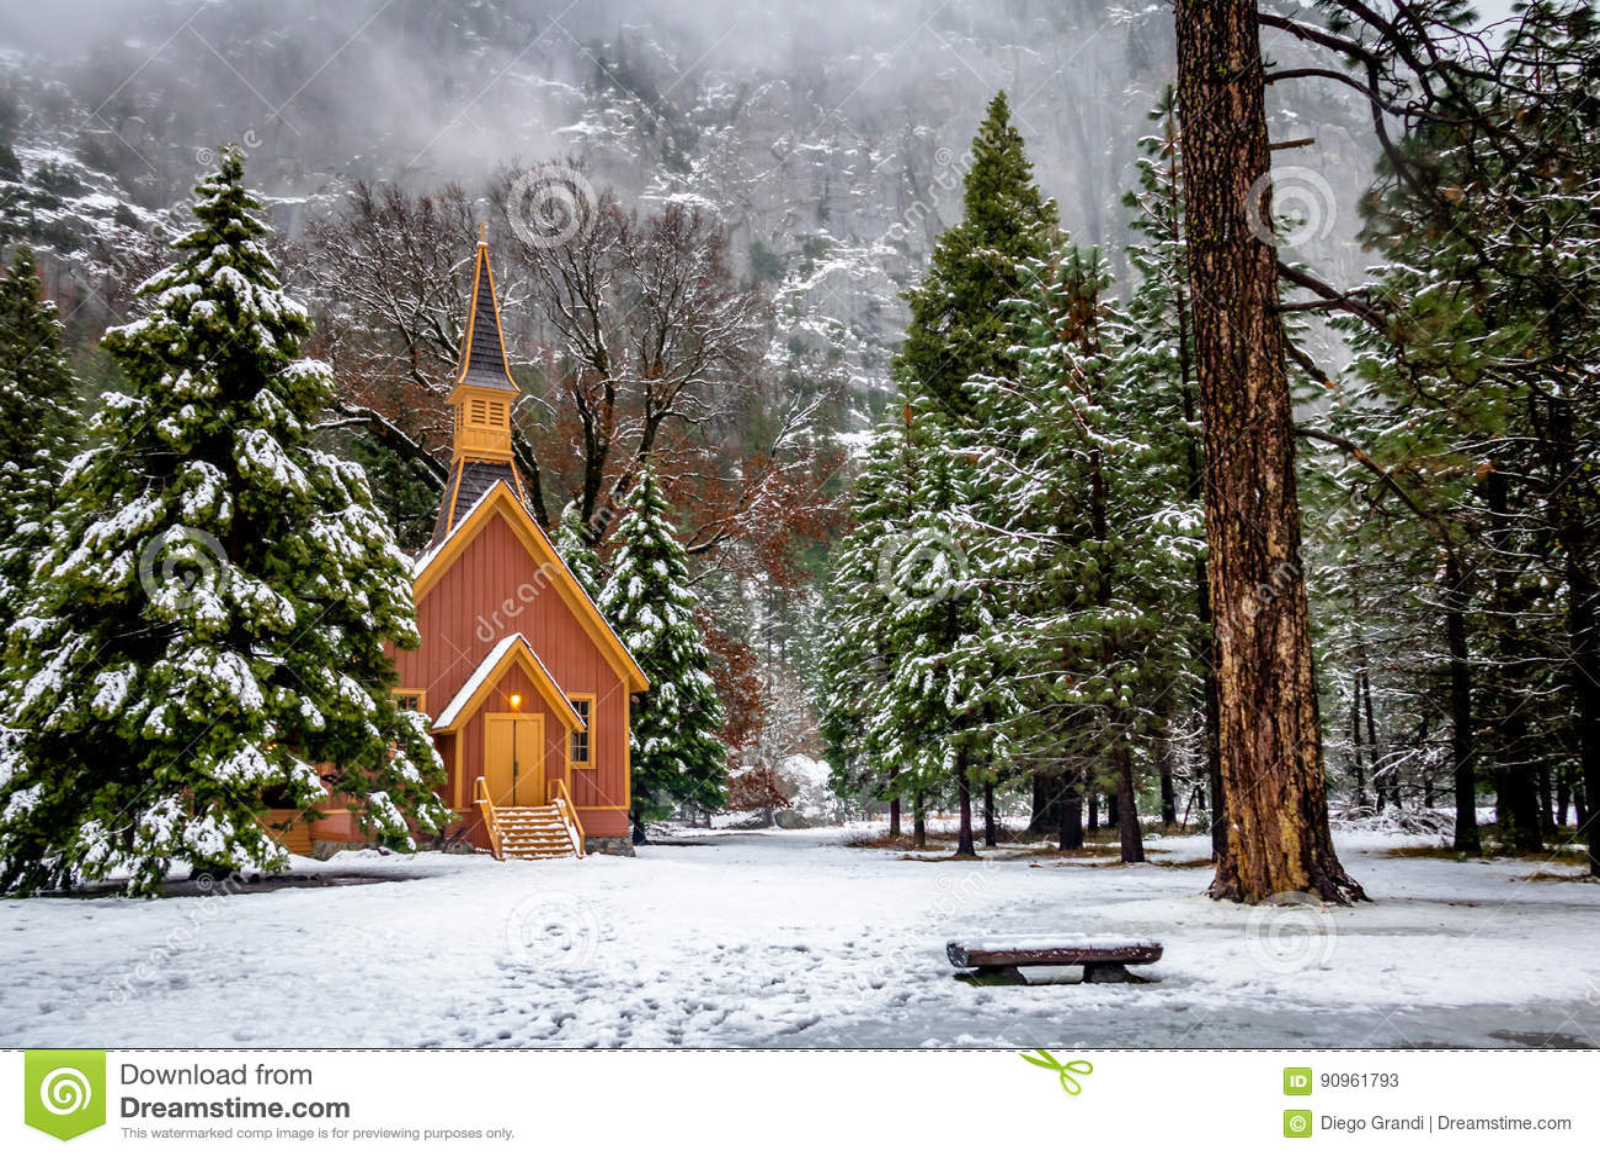 Yosemite Valley Chapel at winter - Yosemite National Park, California, USA